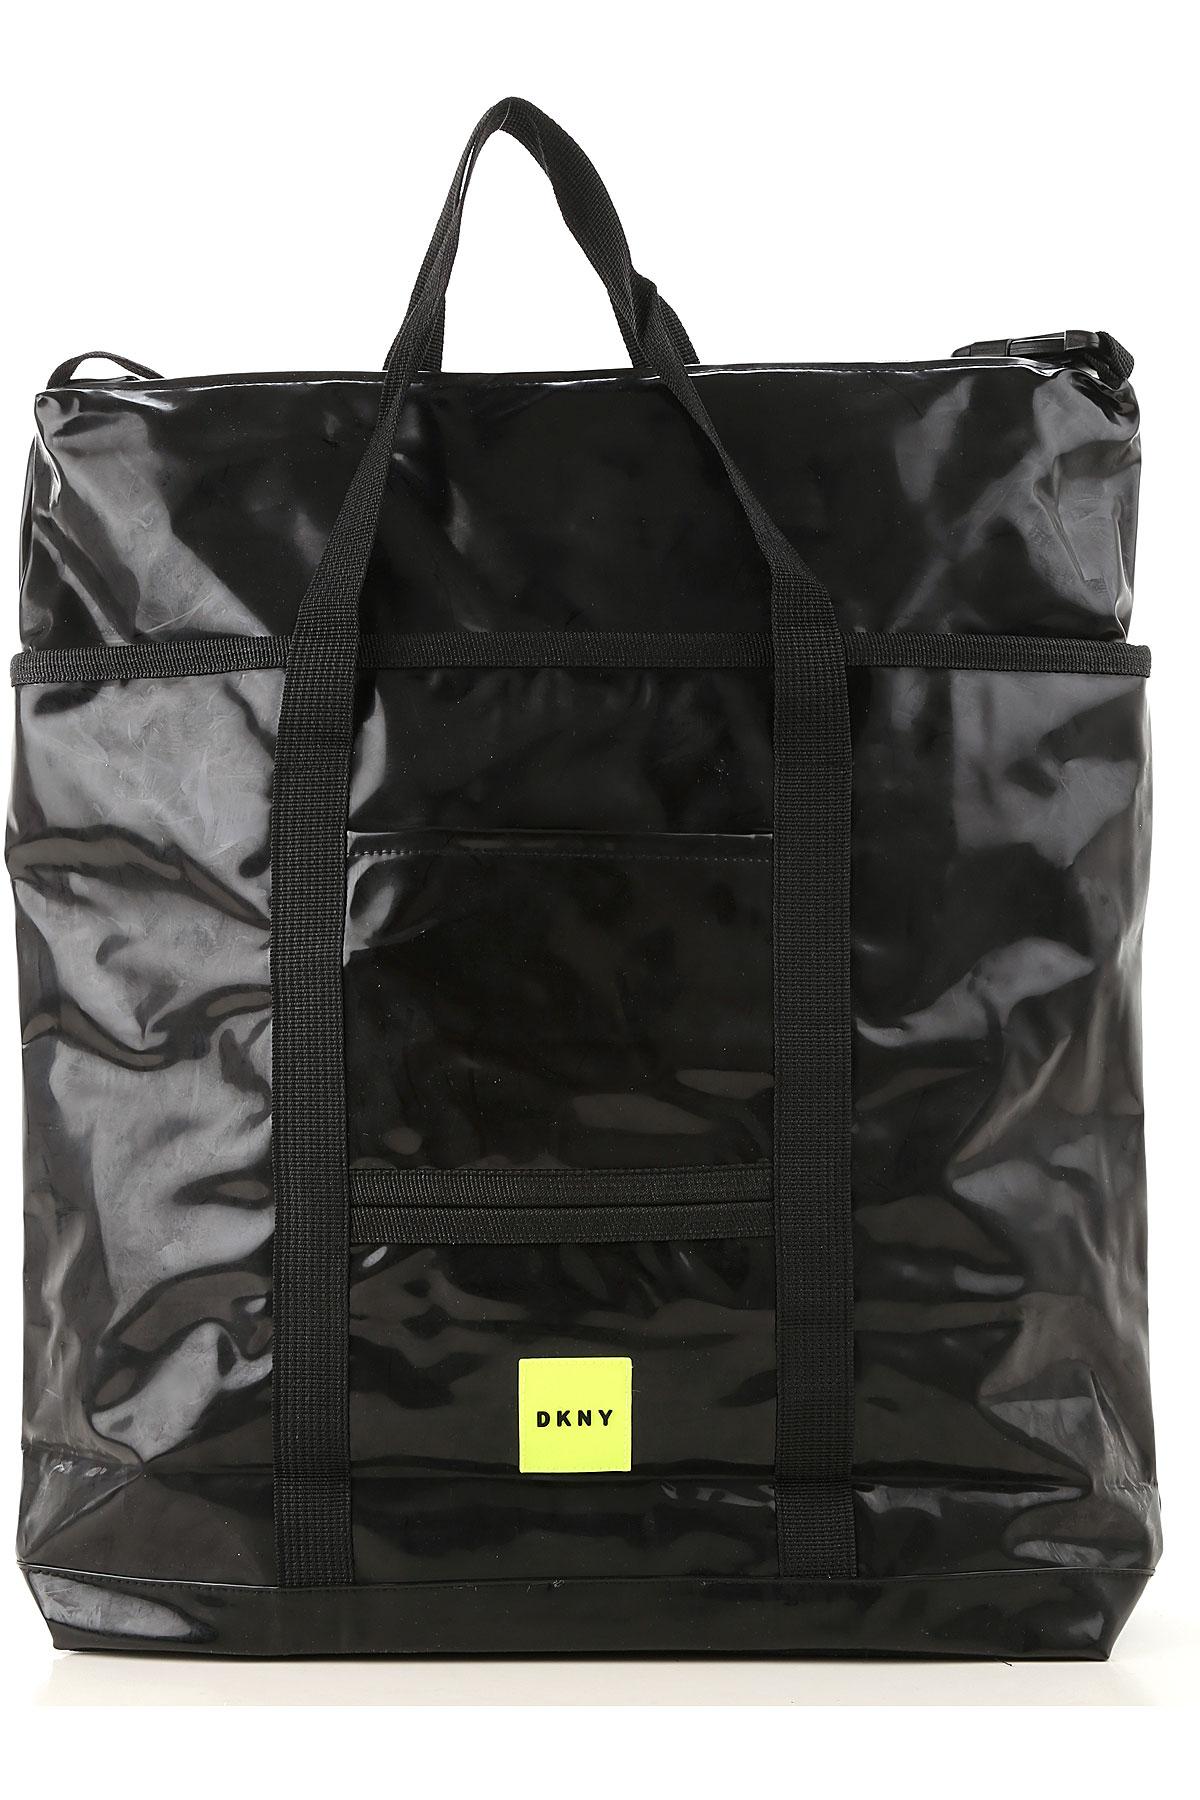 DKNY Girls Handbag On Sale, Black, polyurethane, 2019